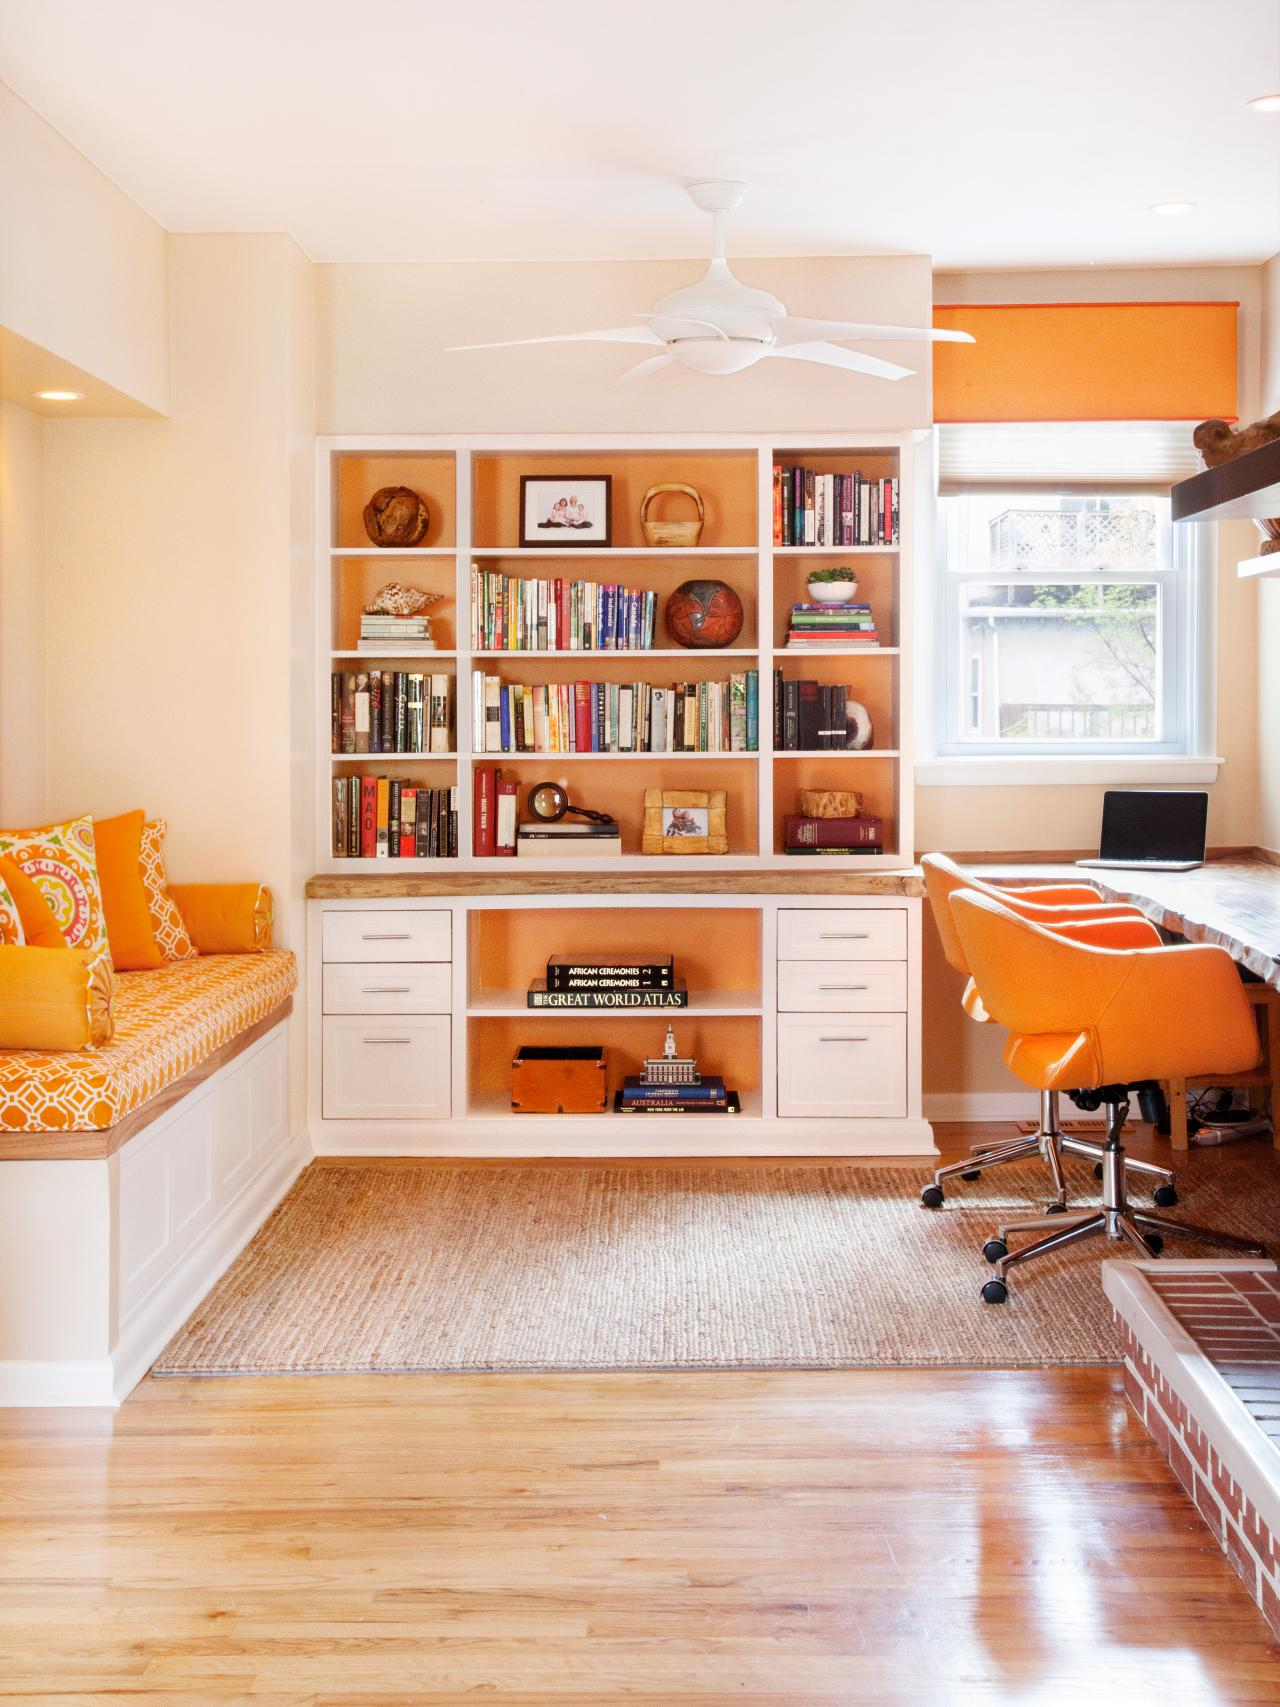 RS_amy-cuker-orange-contemporary-office_3x4.jpg.rend_.hgtvcom.1280.1707.jpg